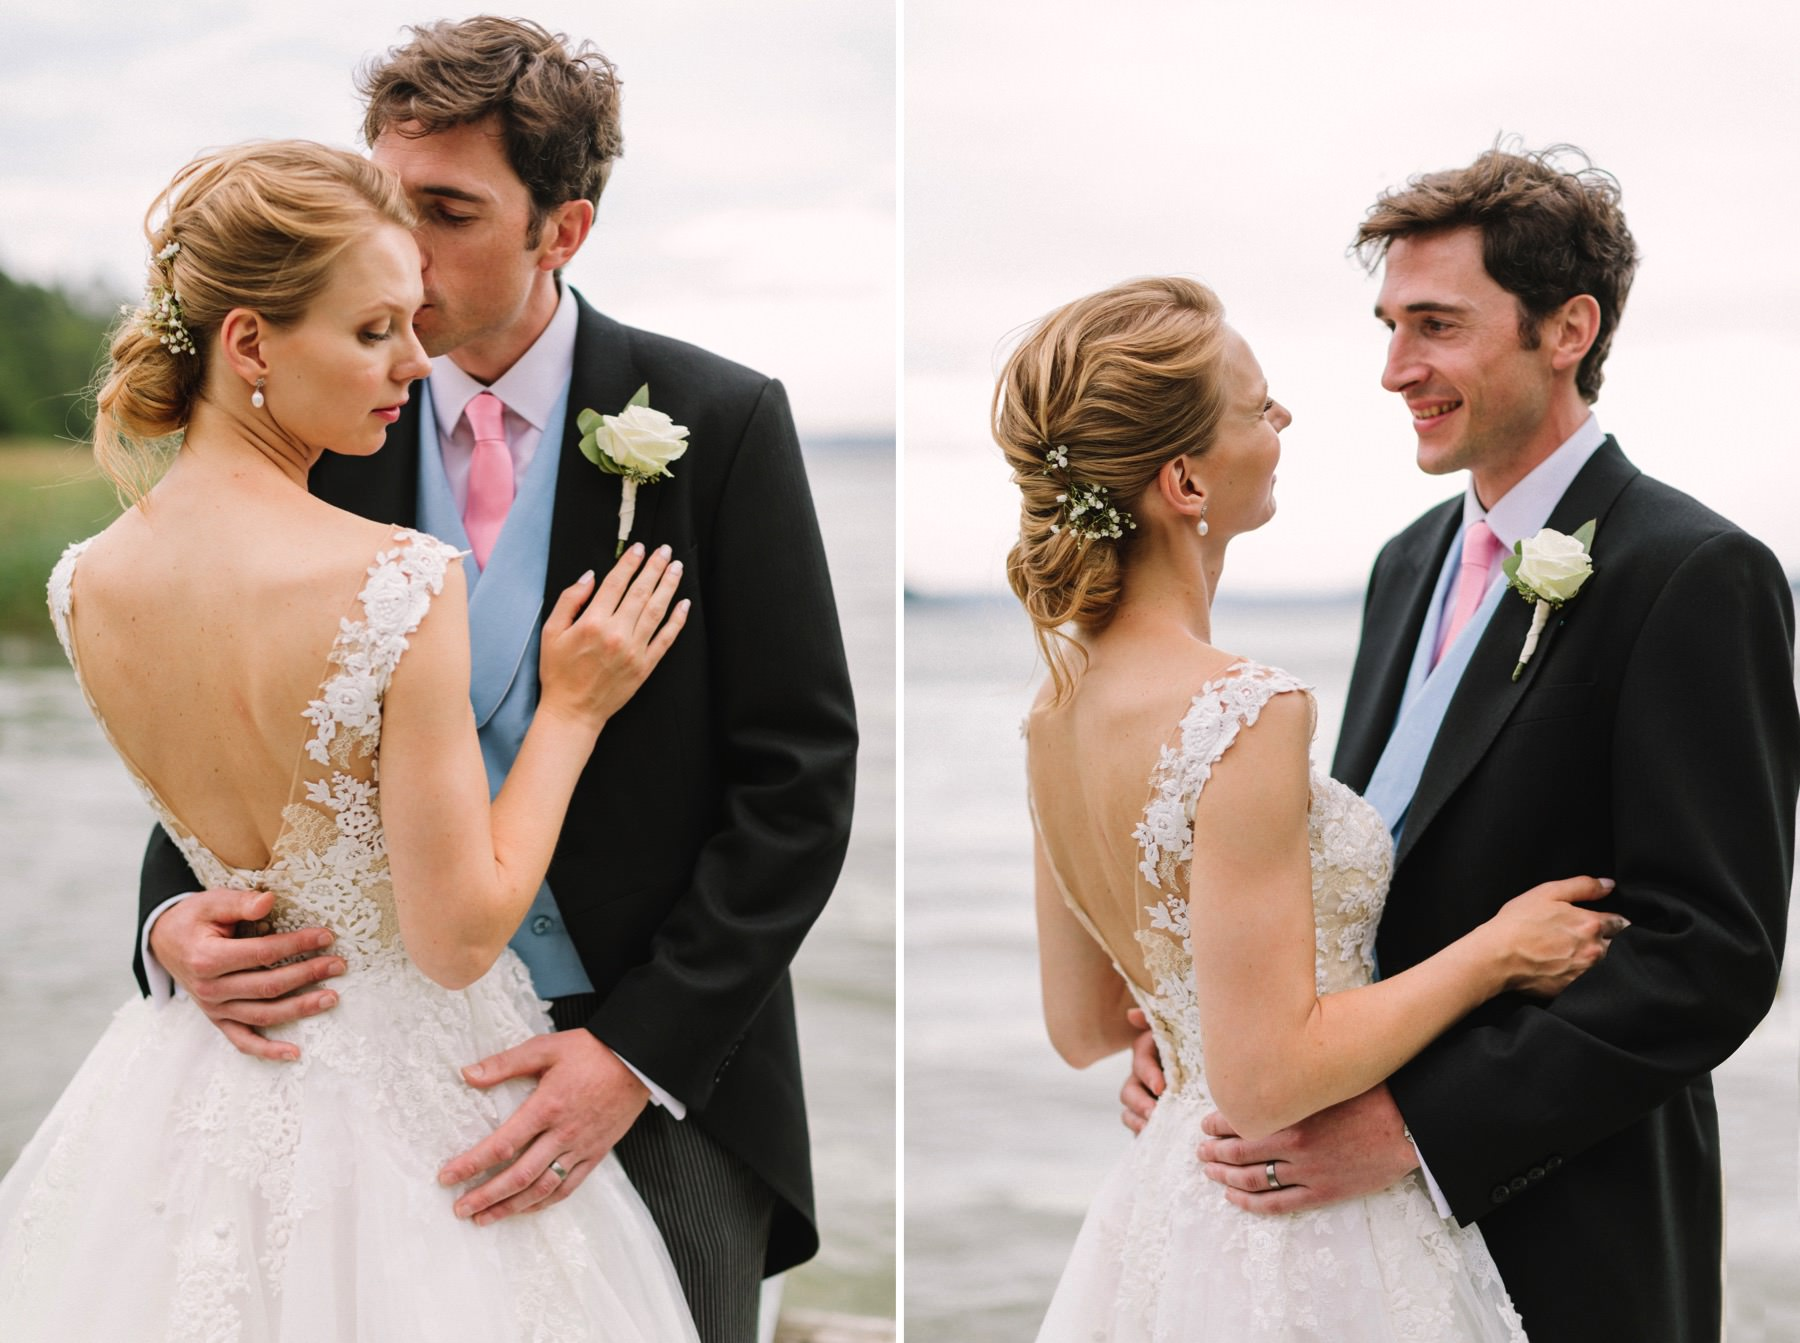 Calliola bröllop bilder